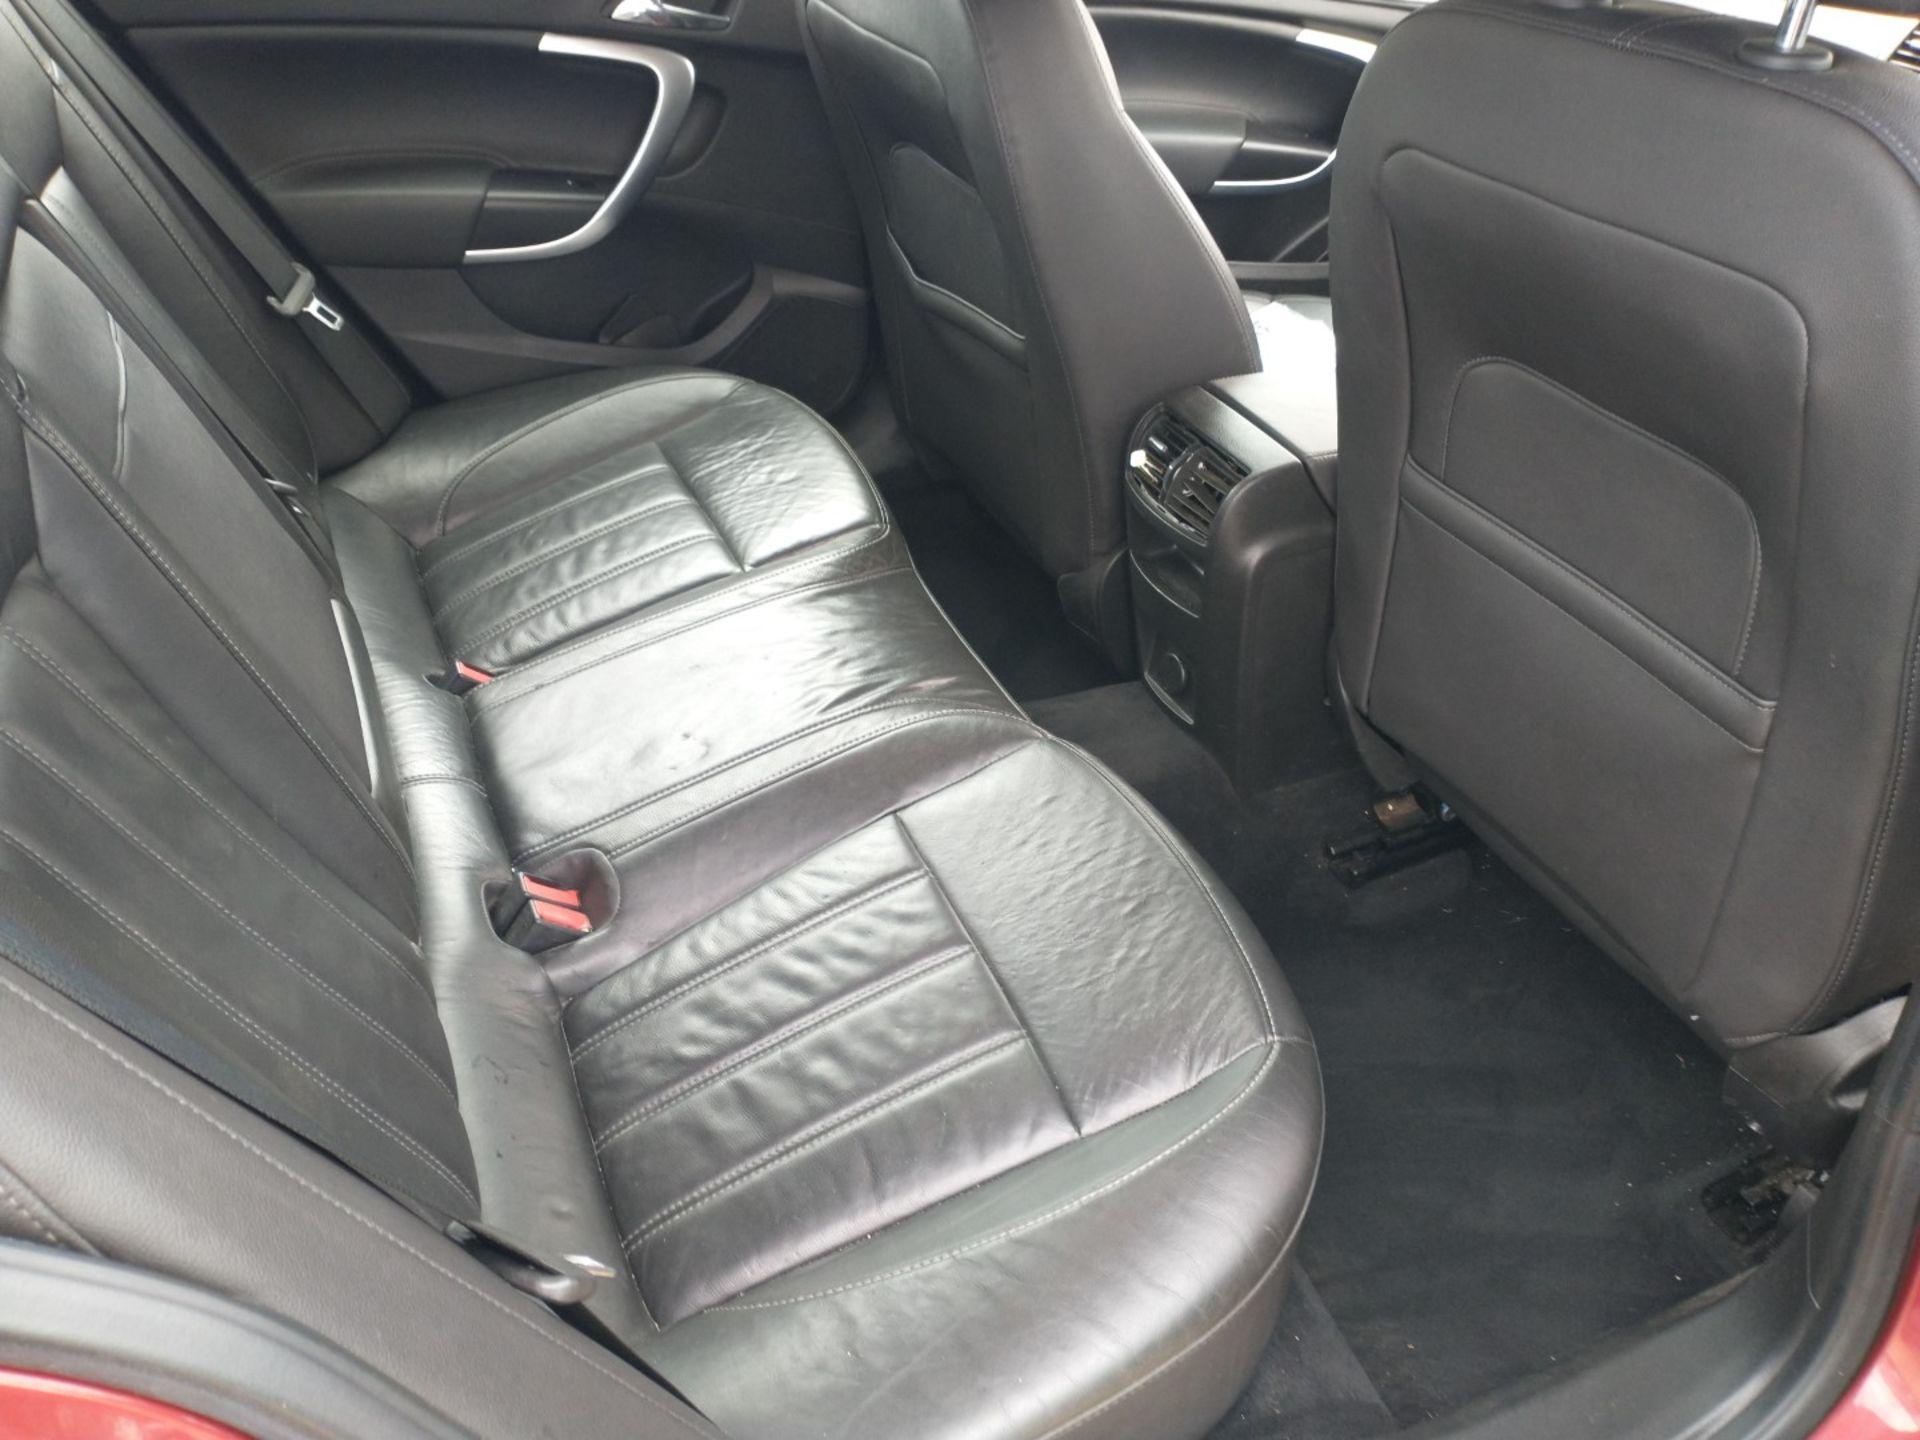 2009 Vauxhall Insignia Elite Nav CDTI 5dr 2.0 Diesel - CL505 - NO VAT ON THE HAMMER - Location: Corb - Image 11 of 22